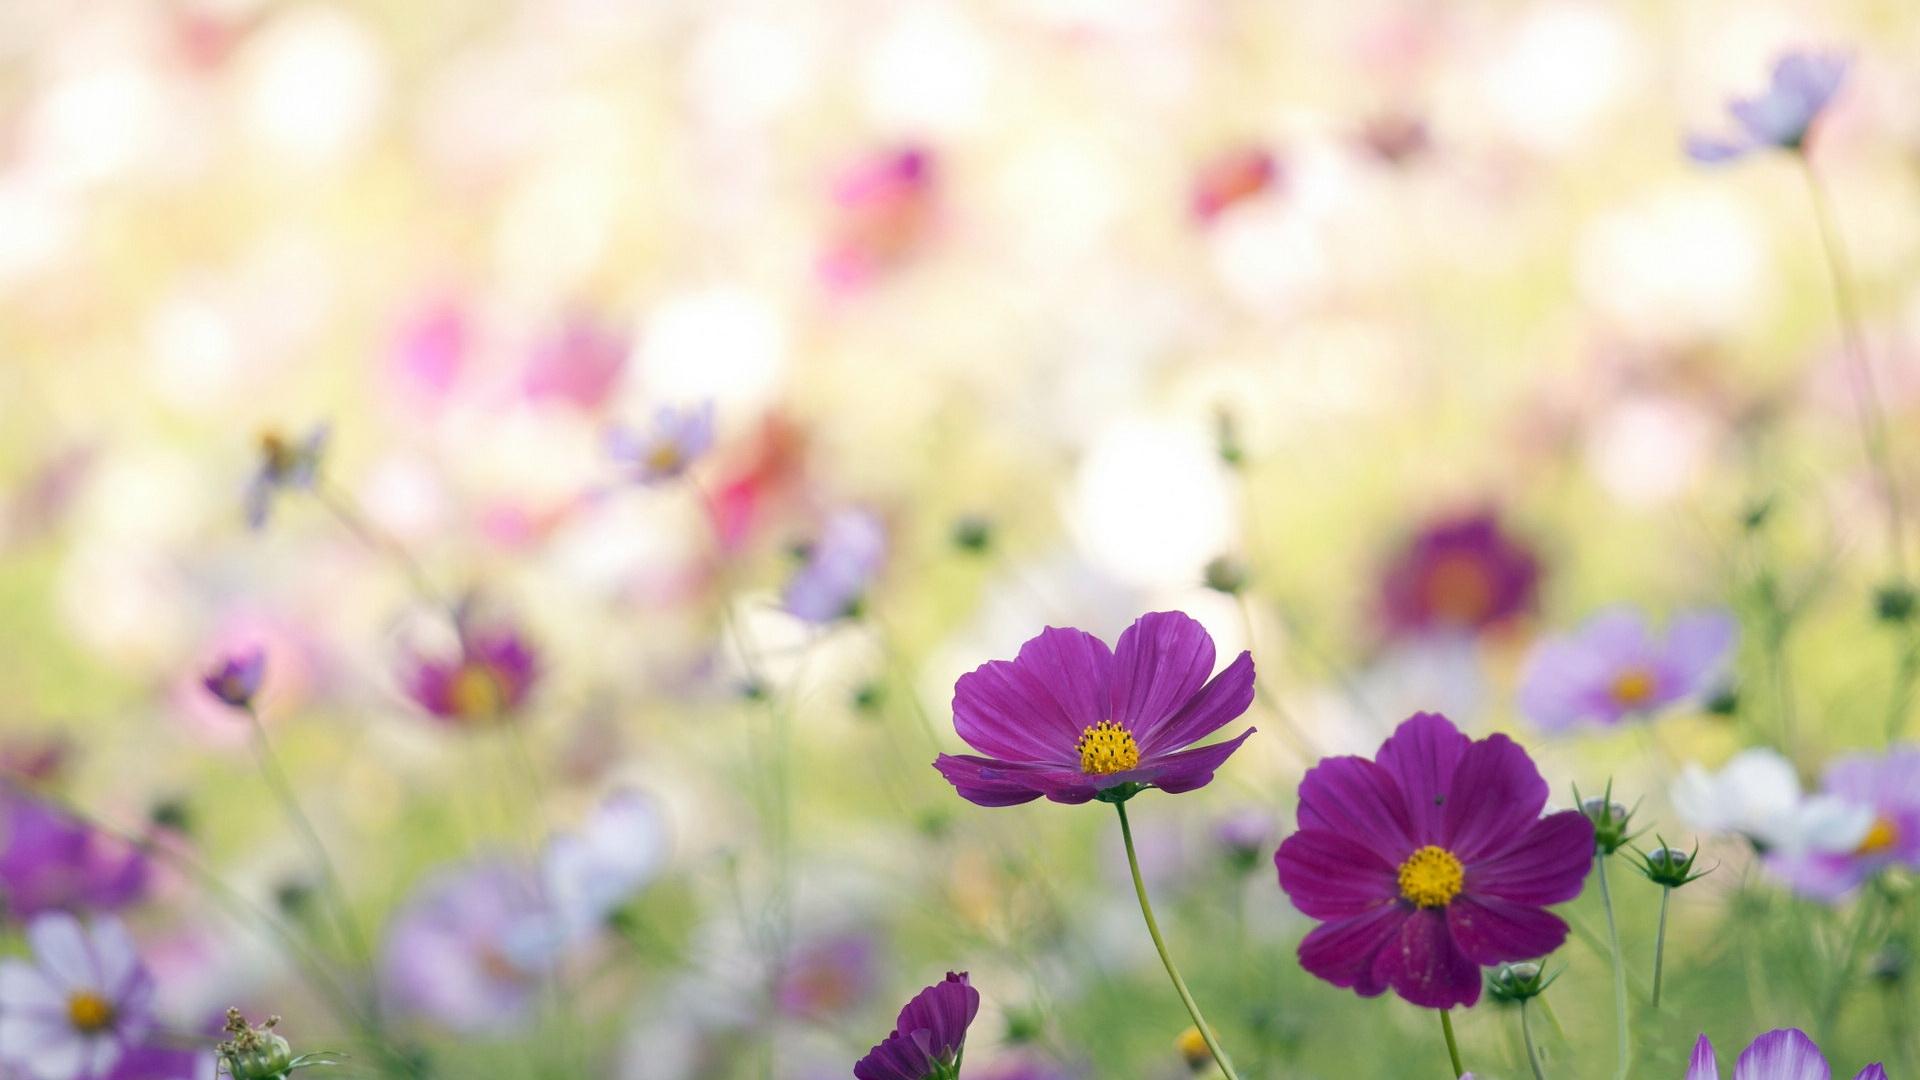 Flowers for Gt Wildflowers Wallpaper